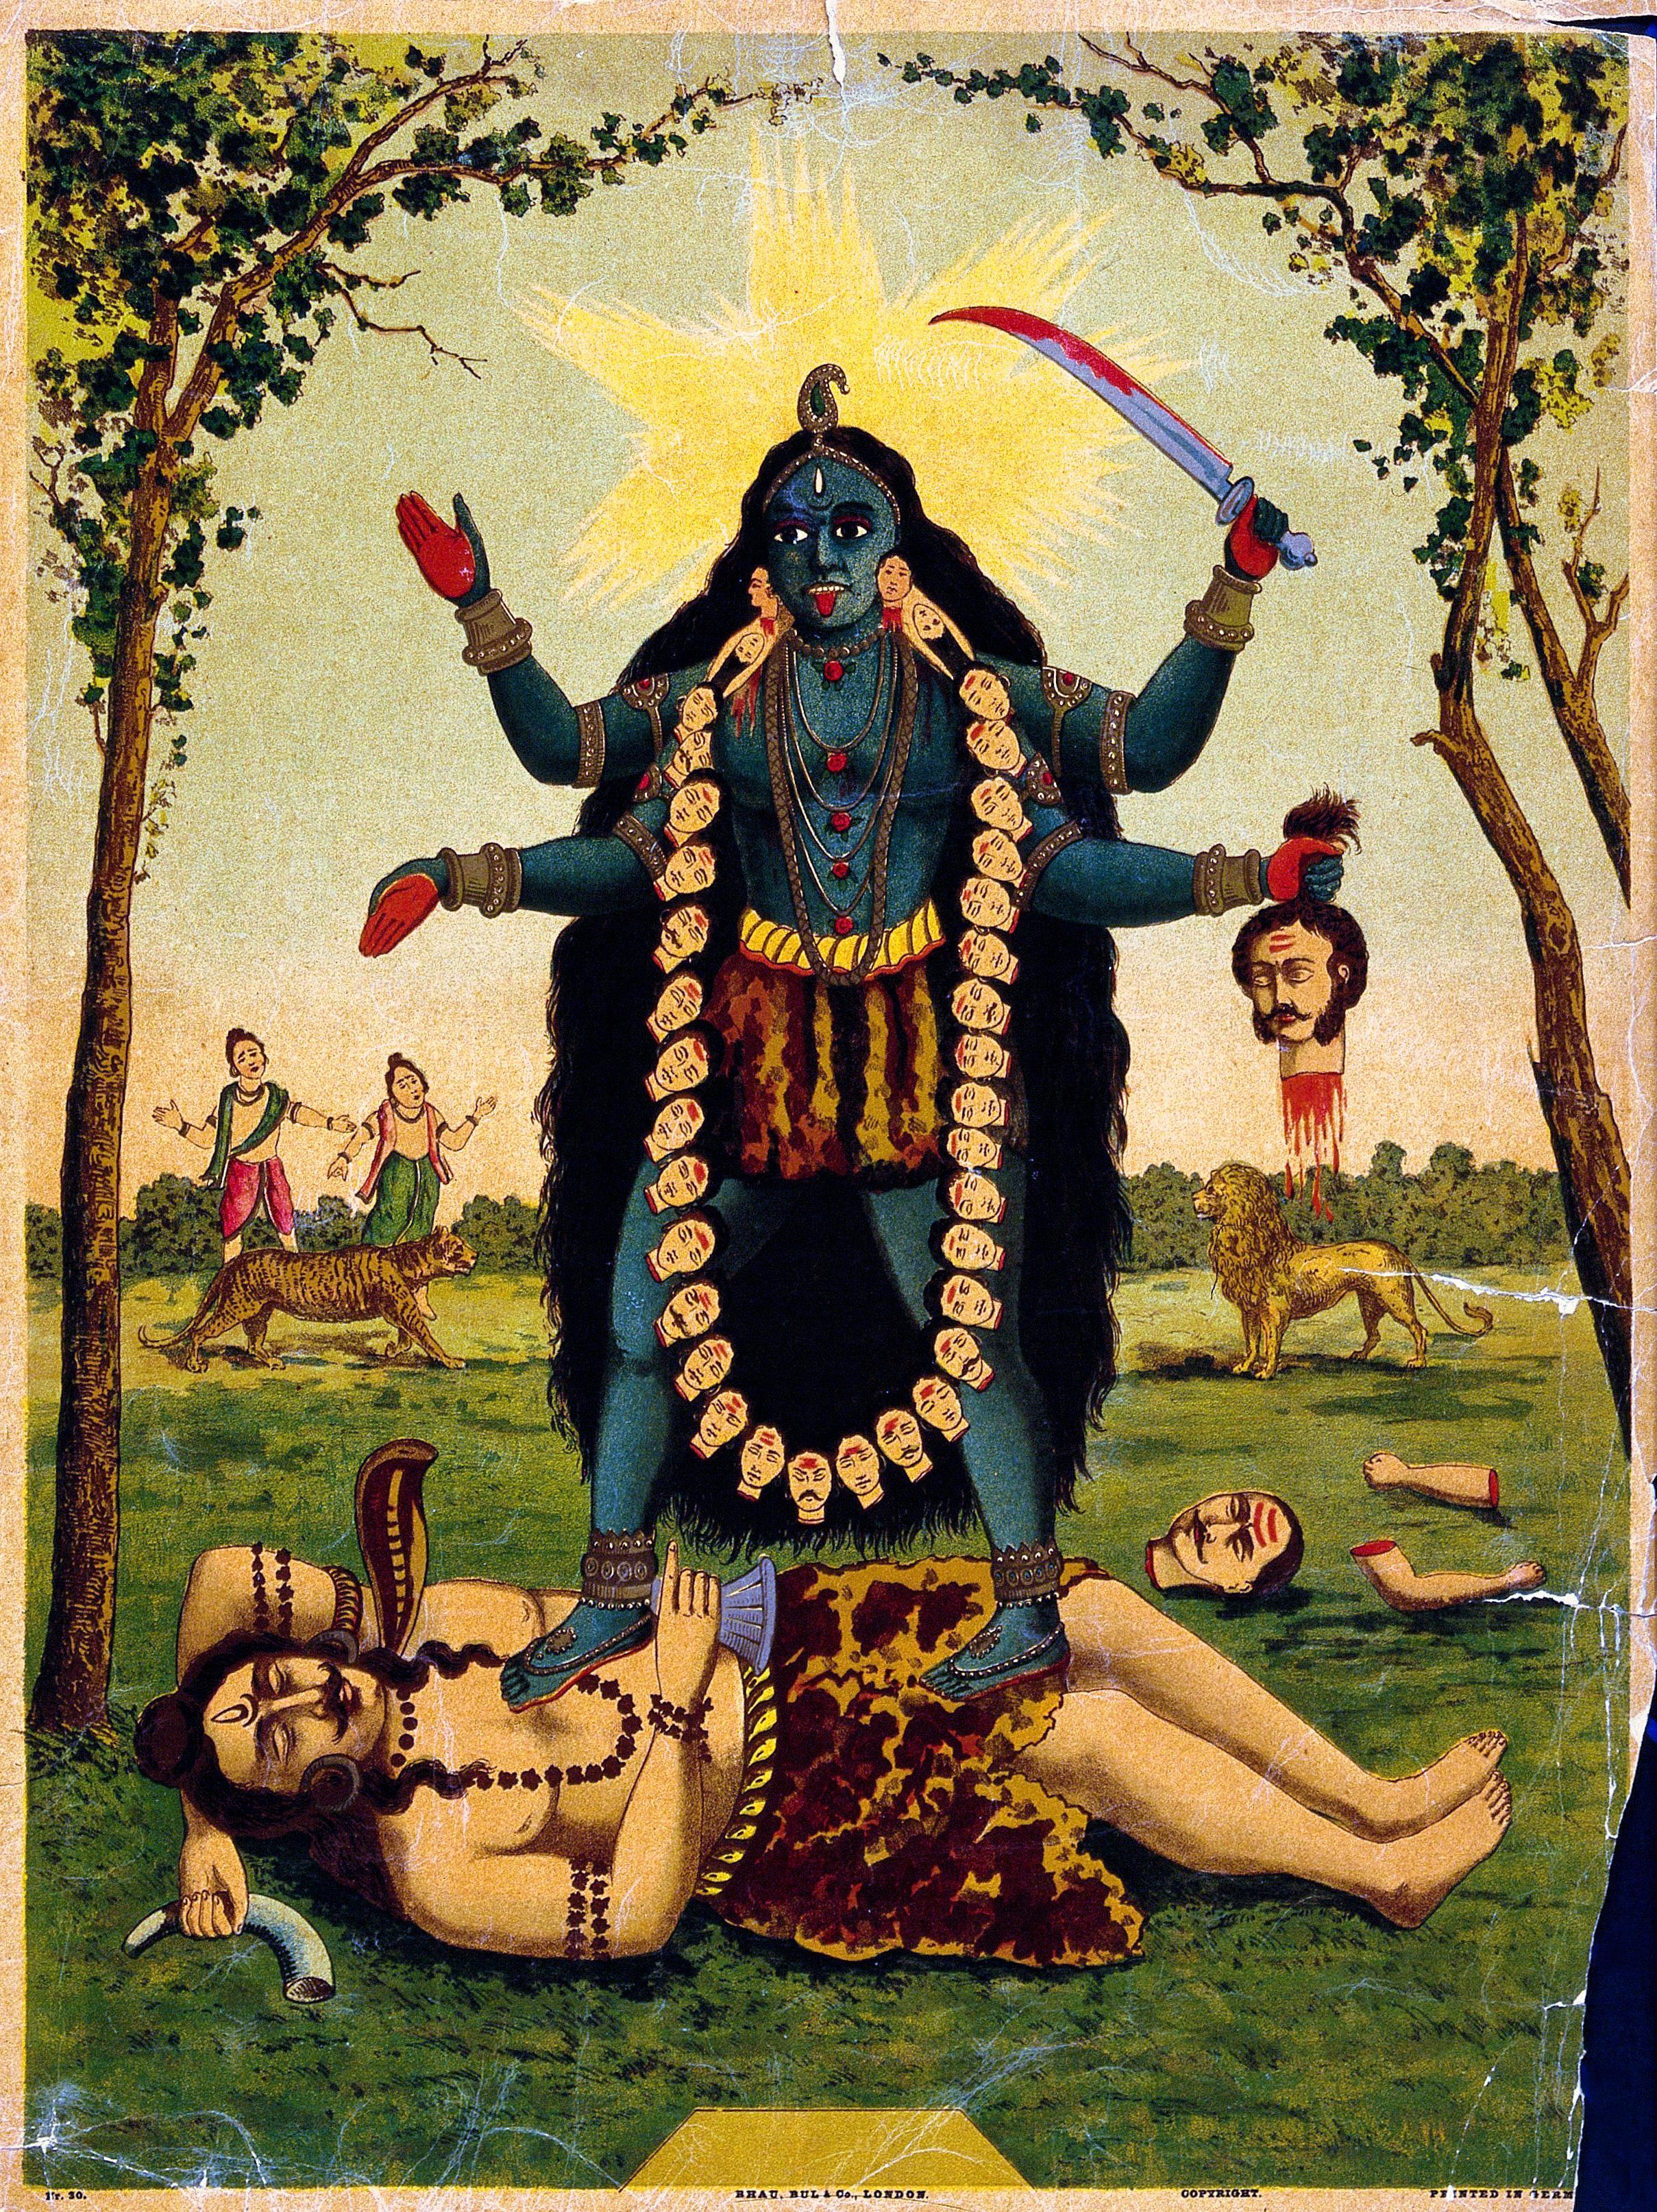 Kali. Chromolithograph by Bhau, Bul & Co. of London, 19th century German print.